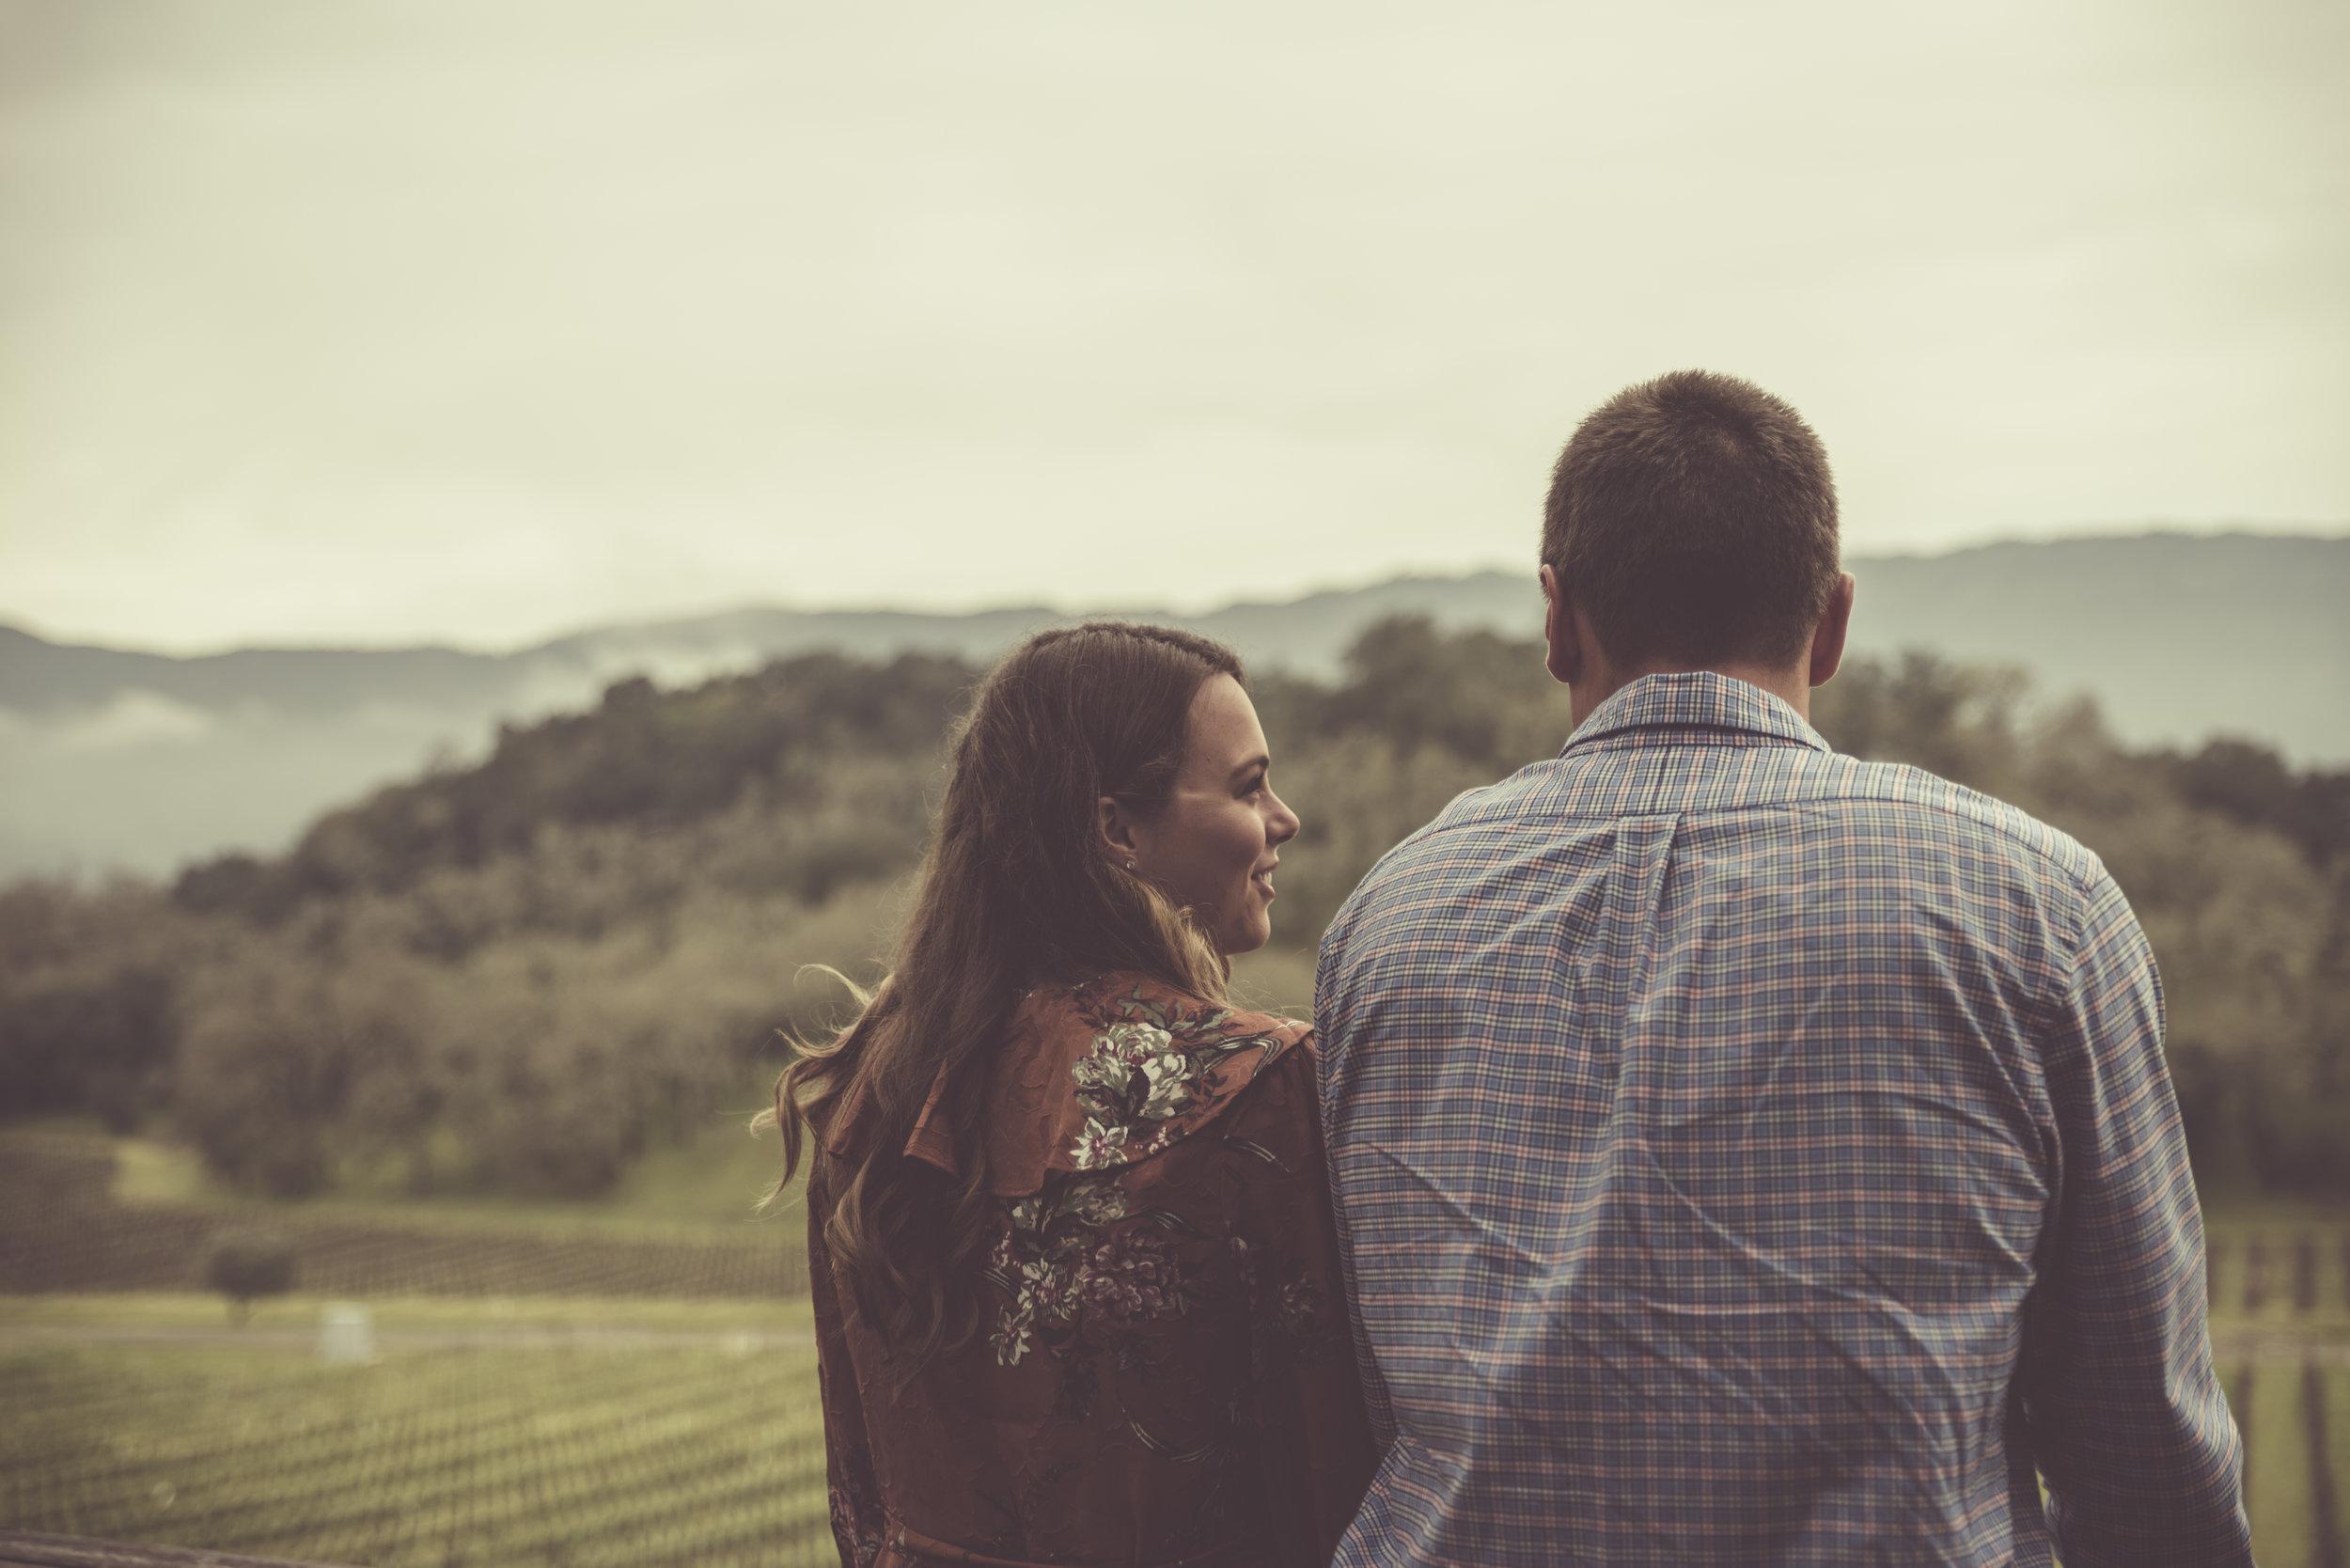 Kevin Proposal Napa / Love